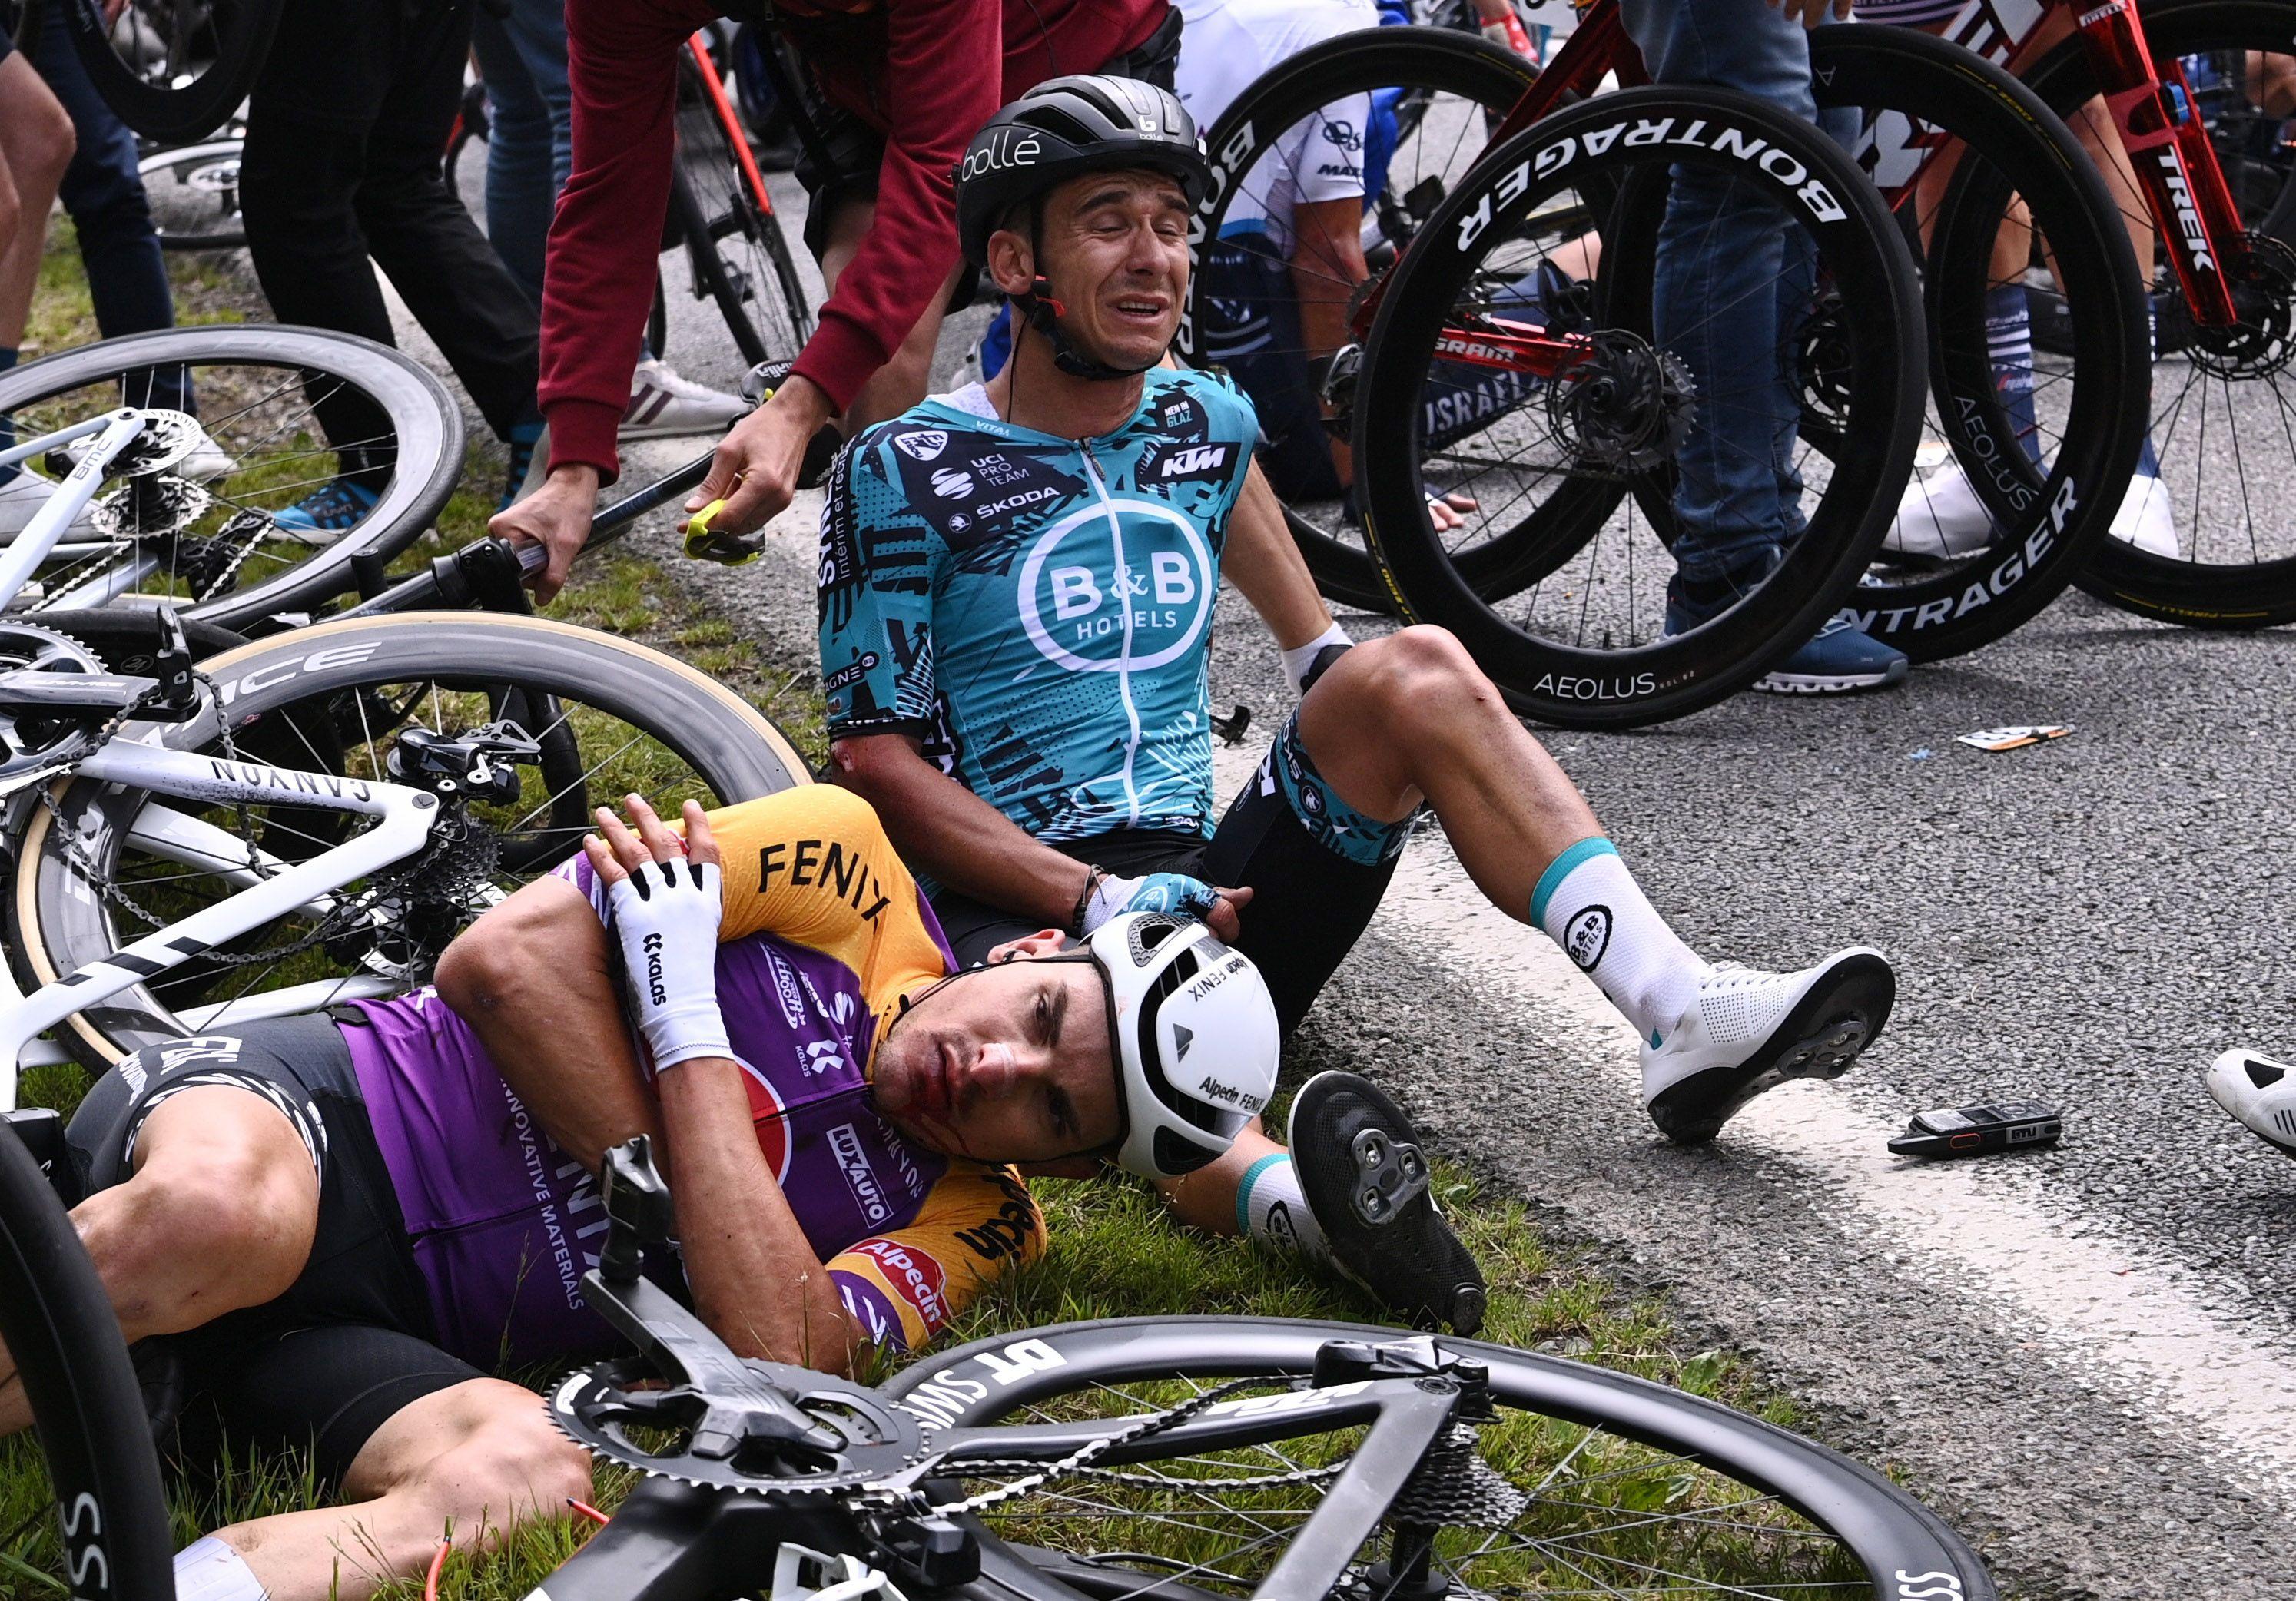 Más de cien ciclistas se vieron involucrados en un grave accidente durante la primera etapa del Tour de France (REUTERS/Anne-Christine Poujoulat)